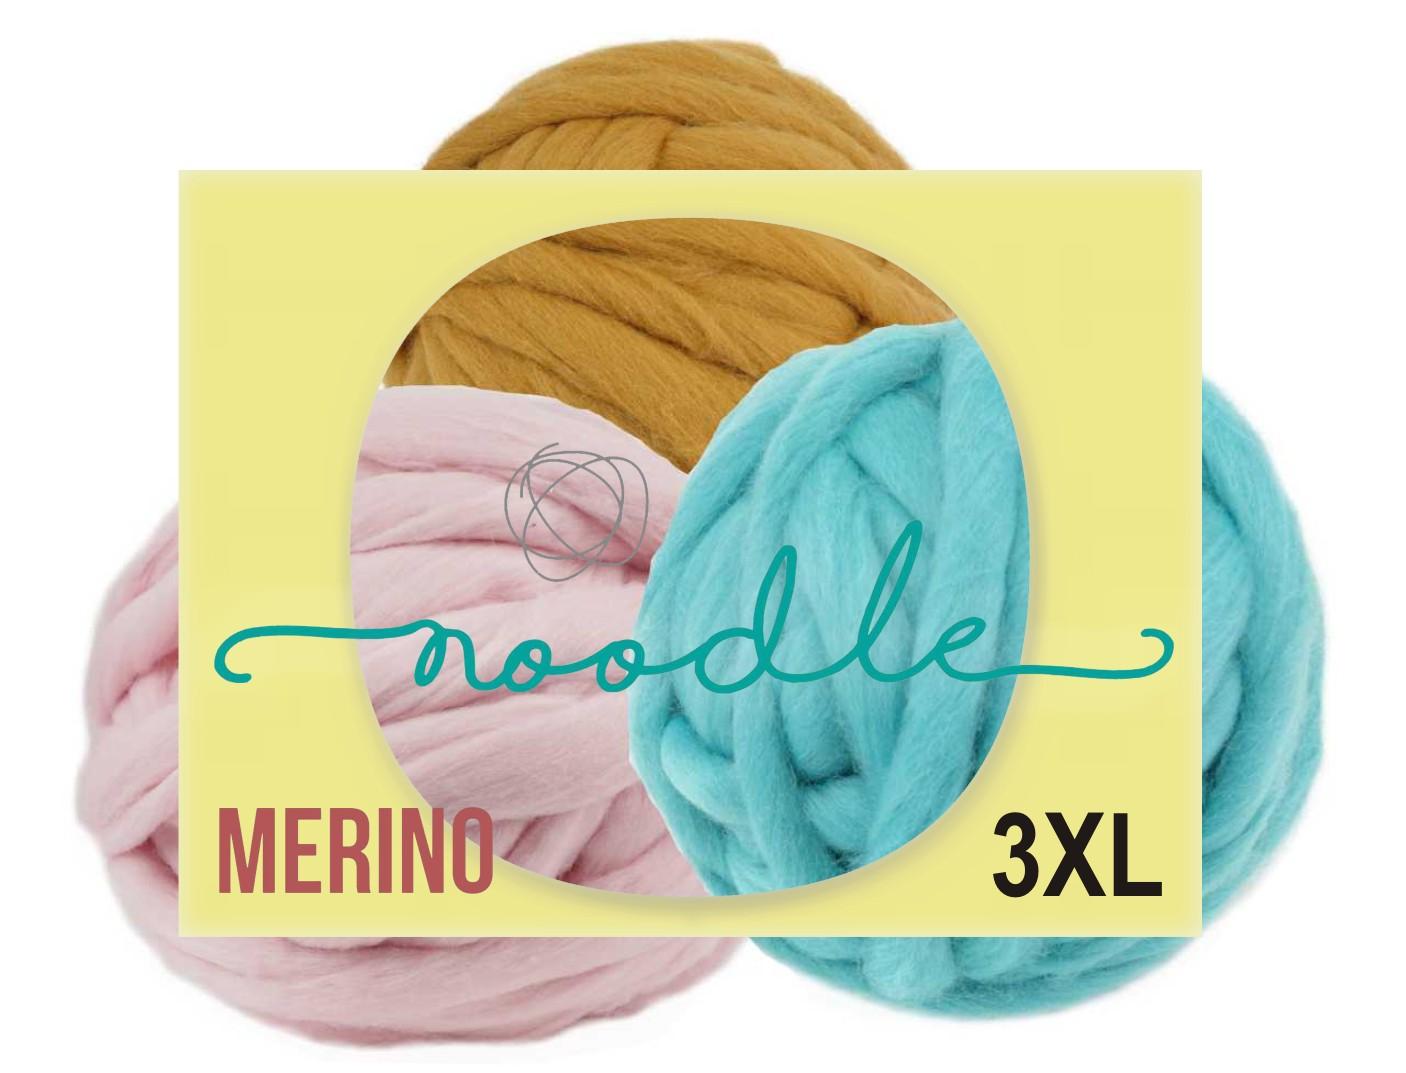 3XL Noodle Merino